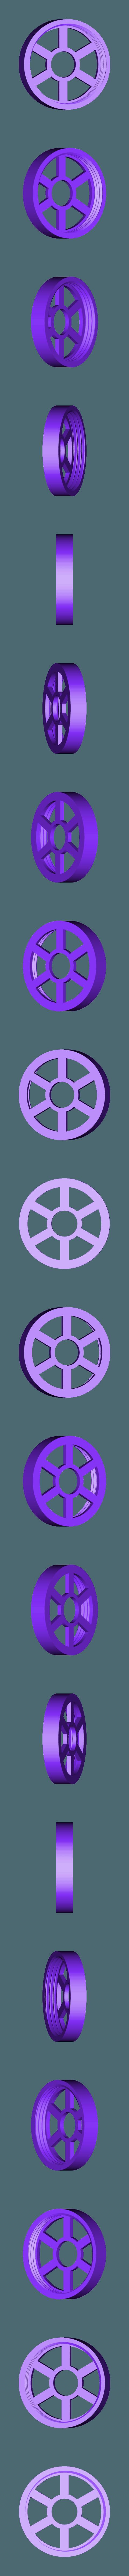 End_Cap_Upper_Inner.stl Download free STL file Two Air Pumps • 3D print object, gzumwalt